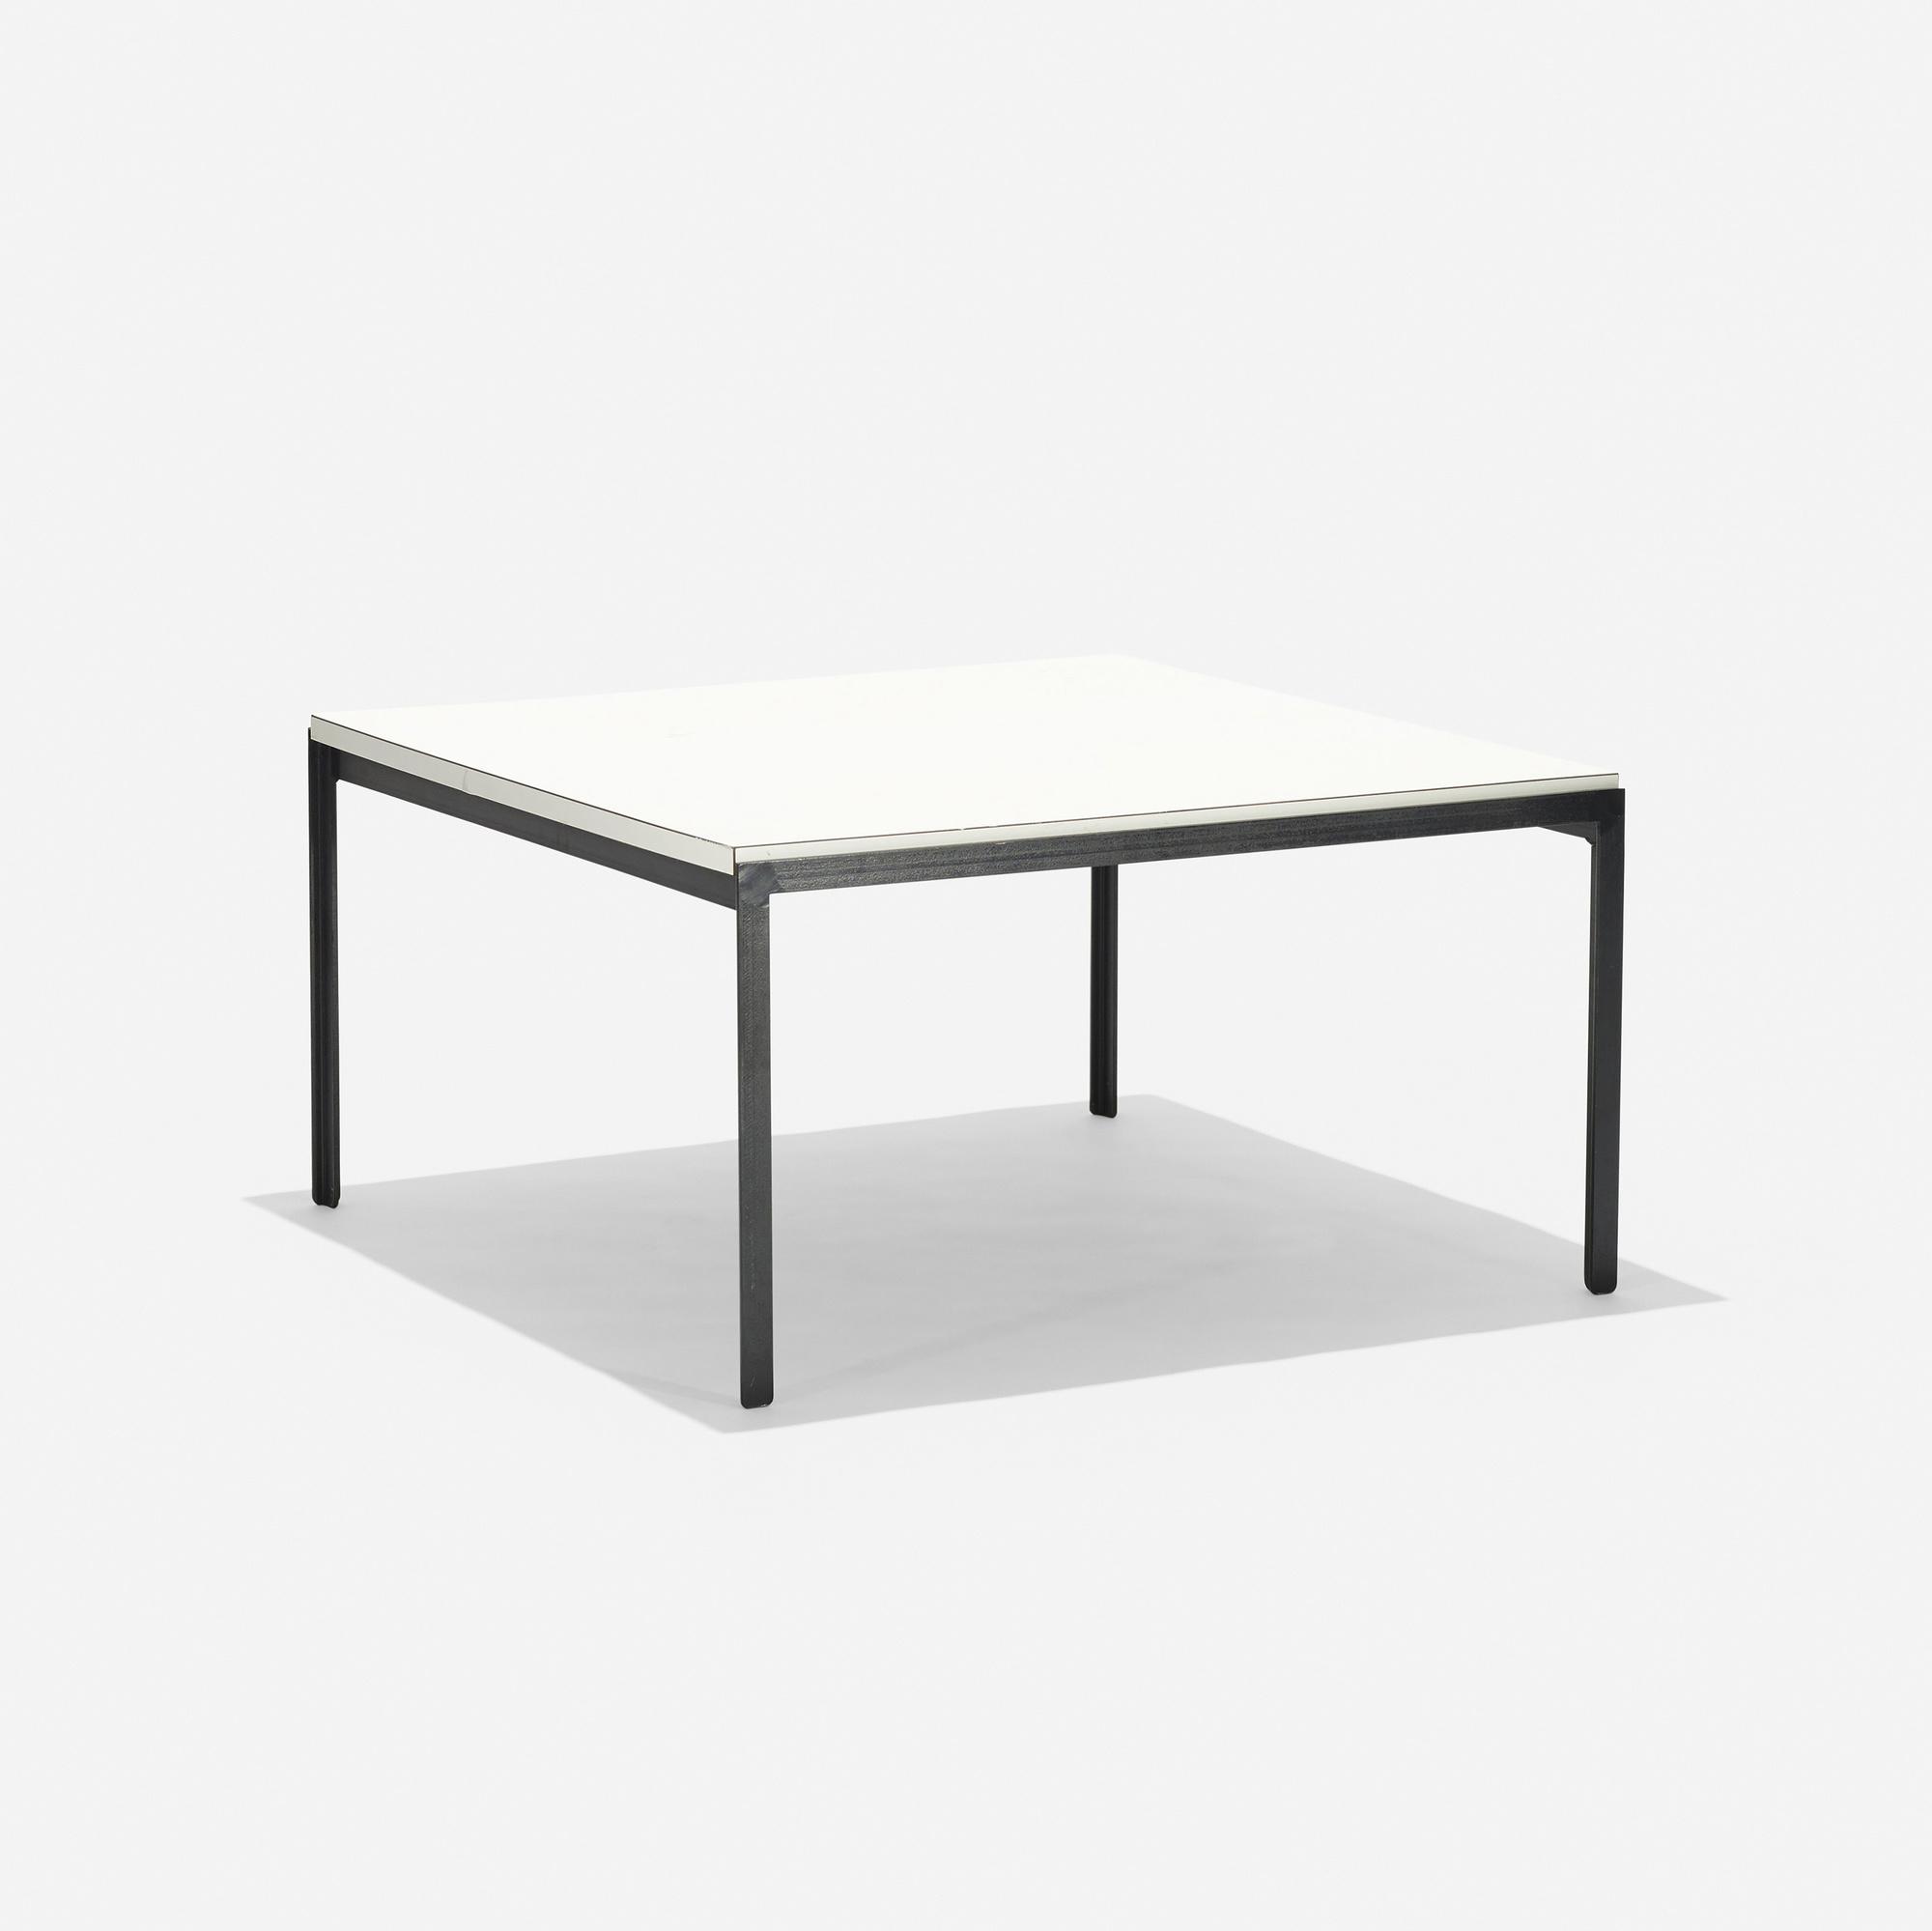 108: Florence Knoll / T Angle Coffee Table (1 Of 2)